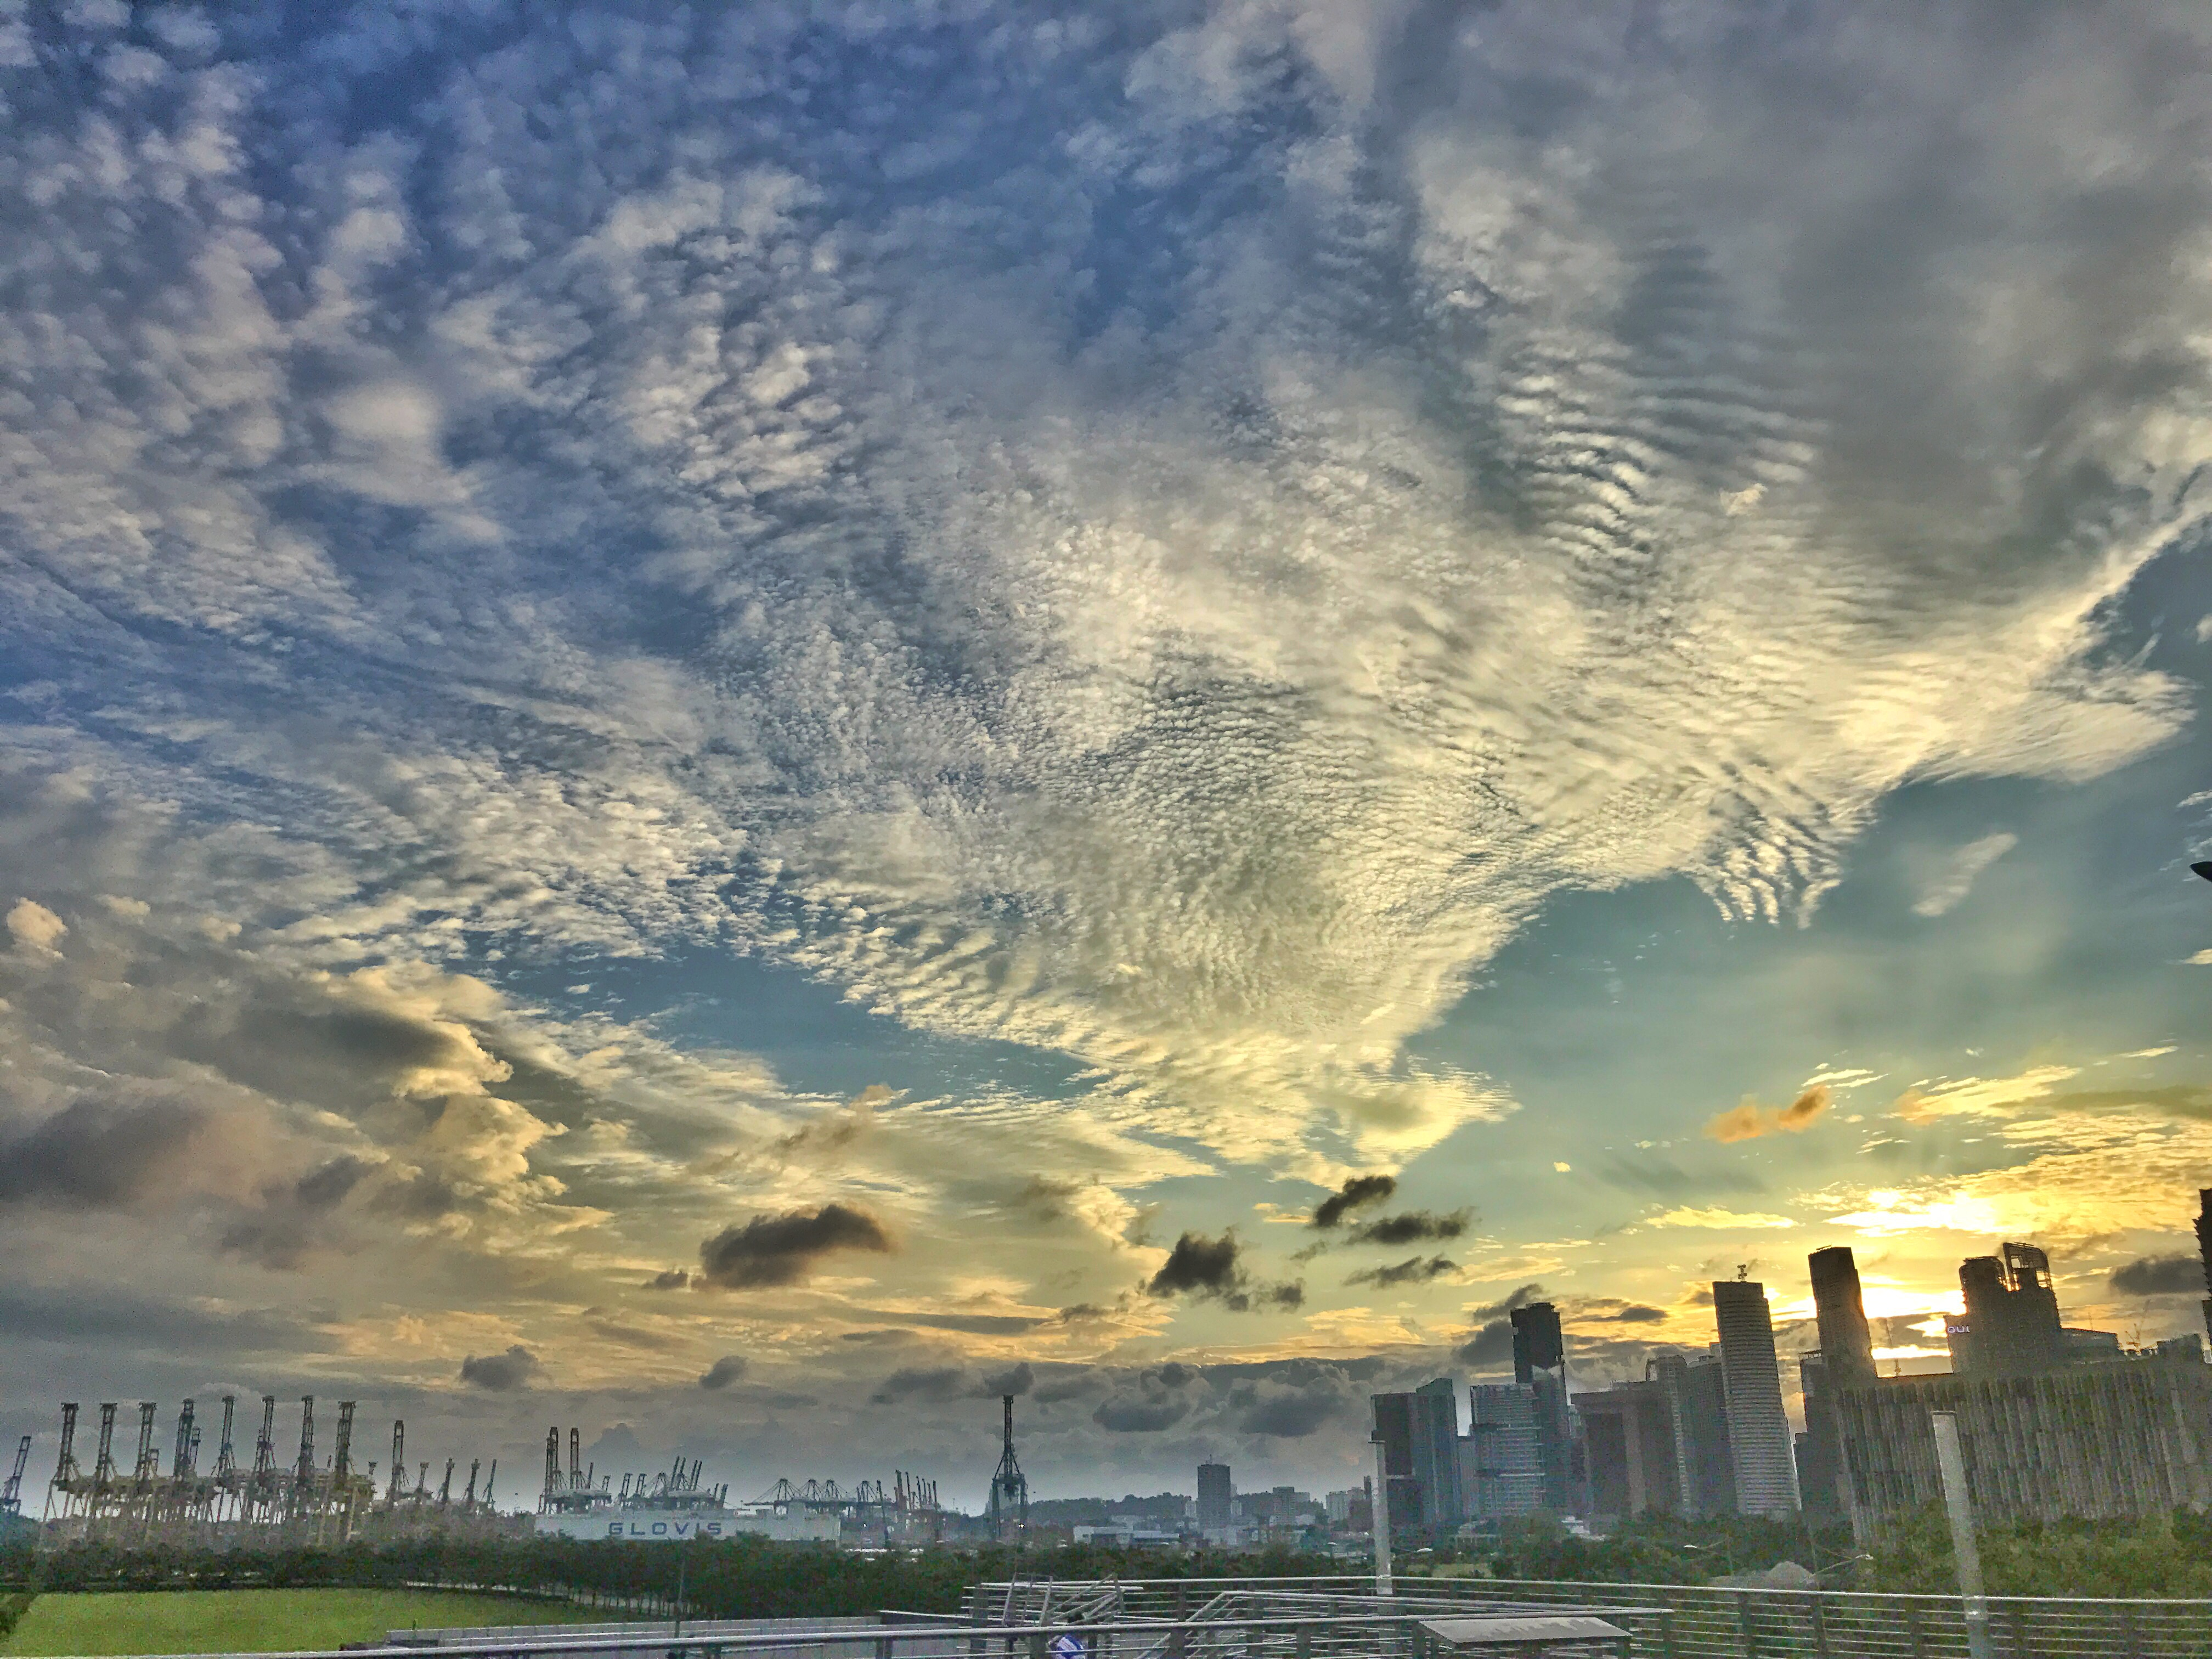 MacRitchie Reservoir Singapore Sunrise Sunset Times